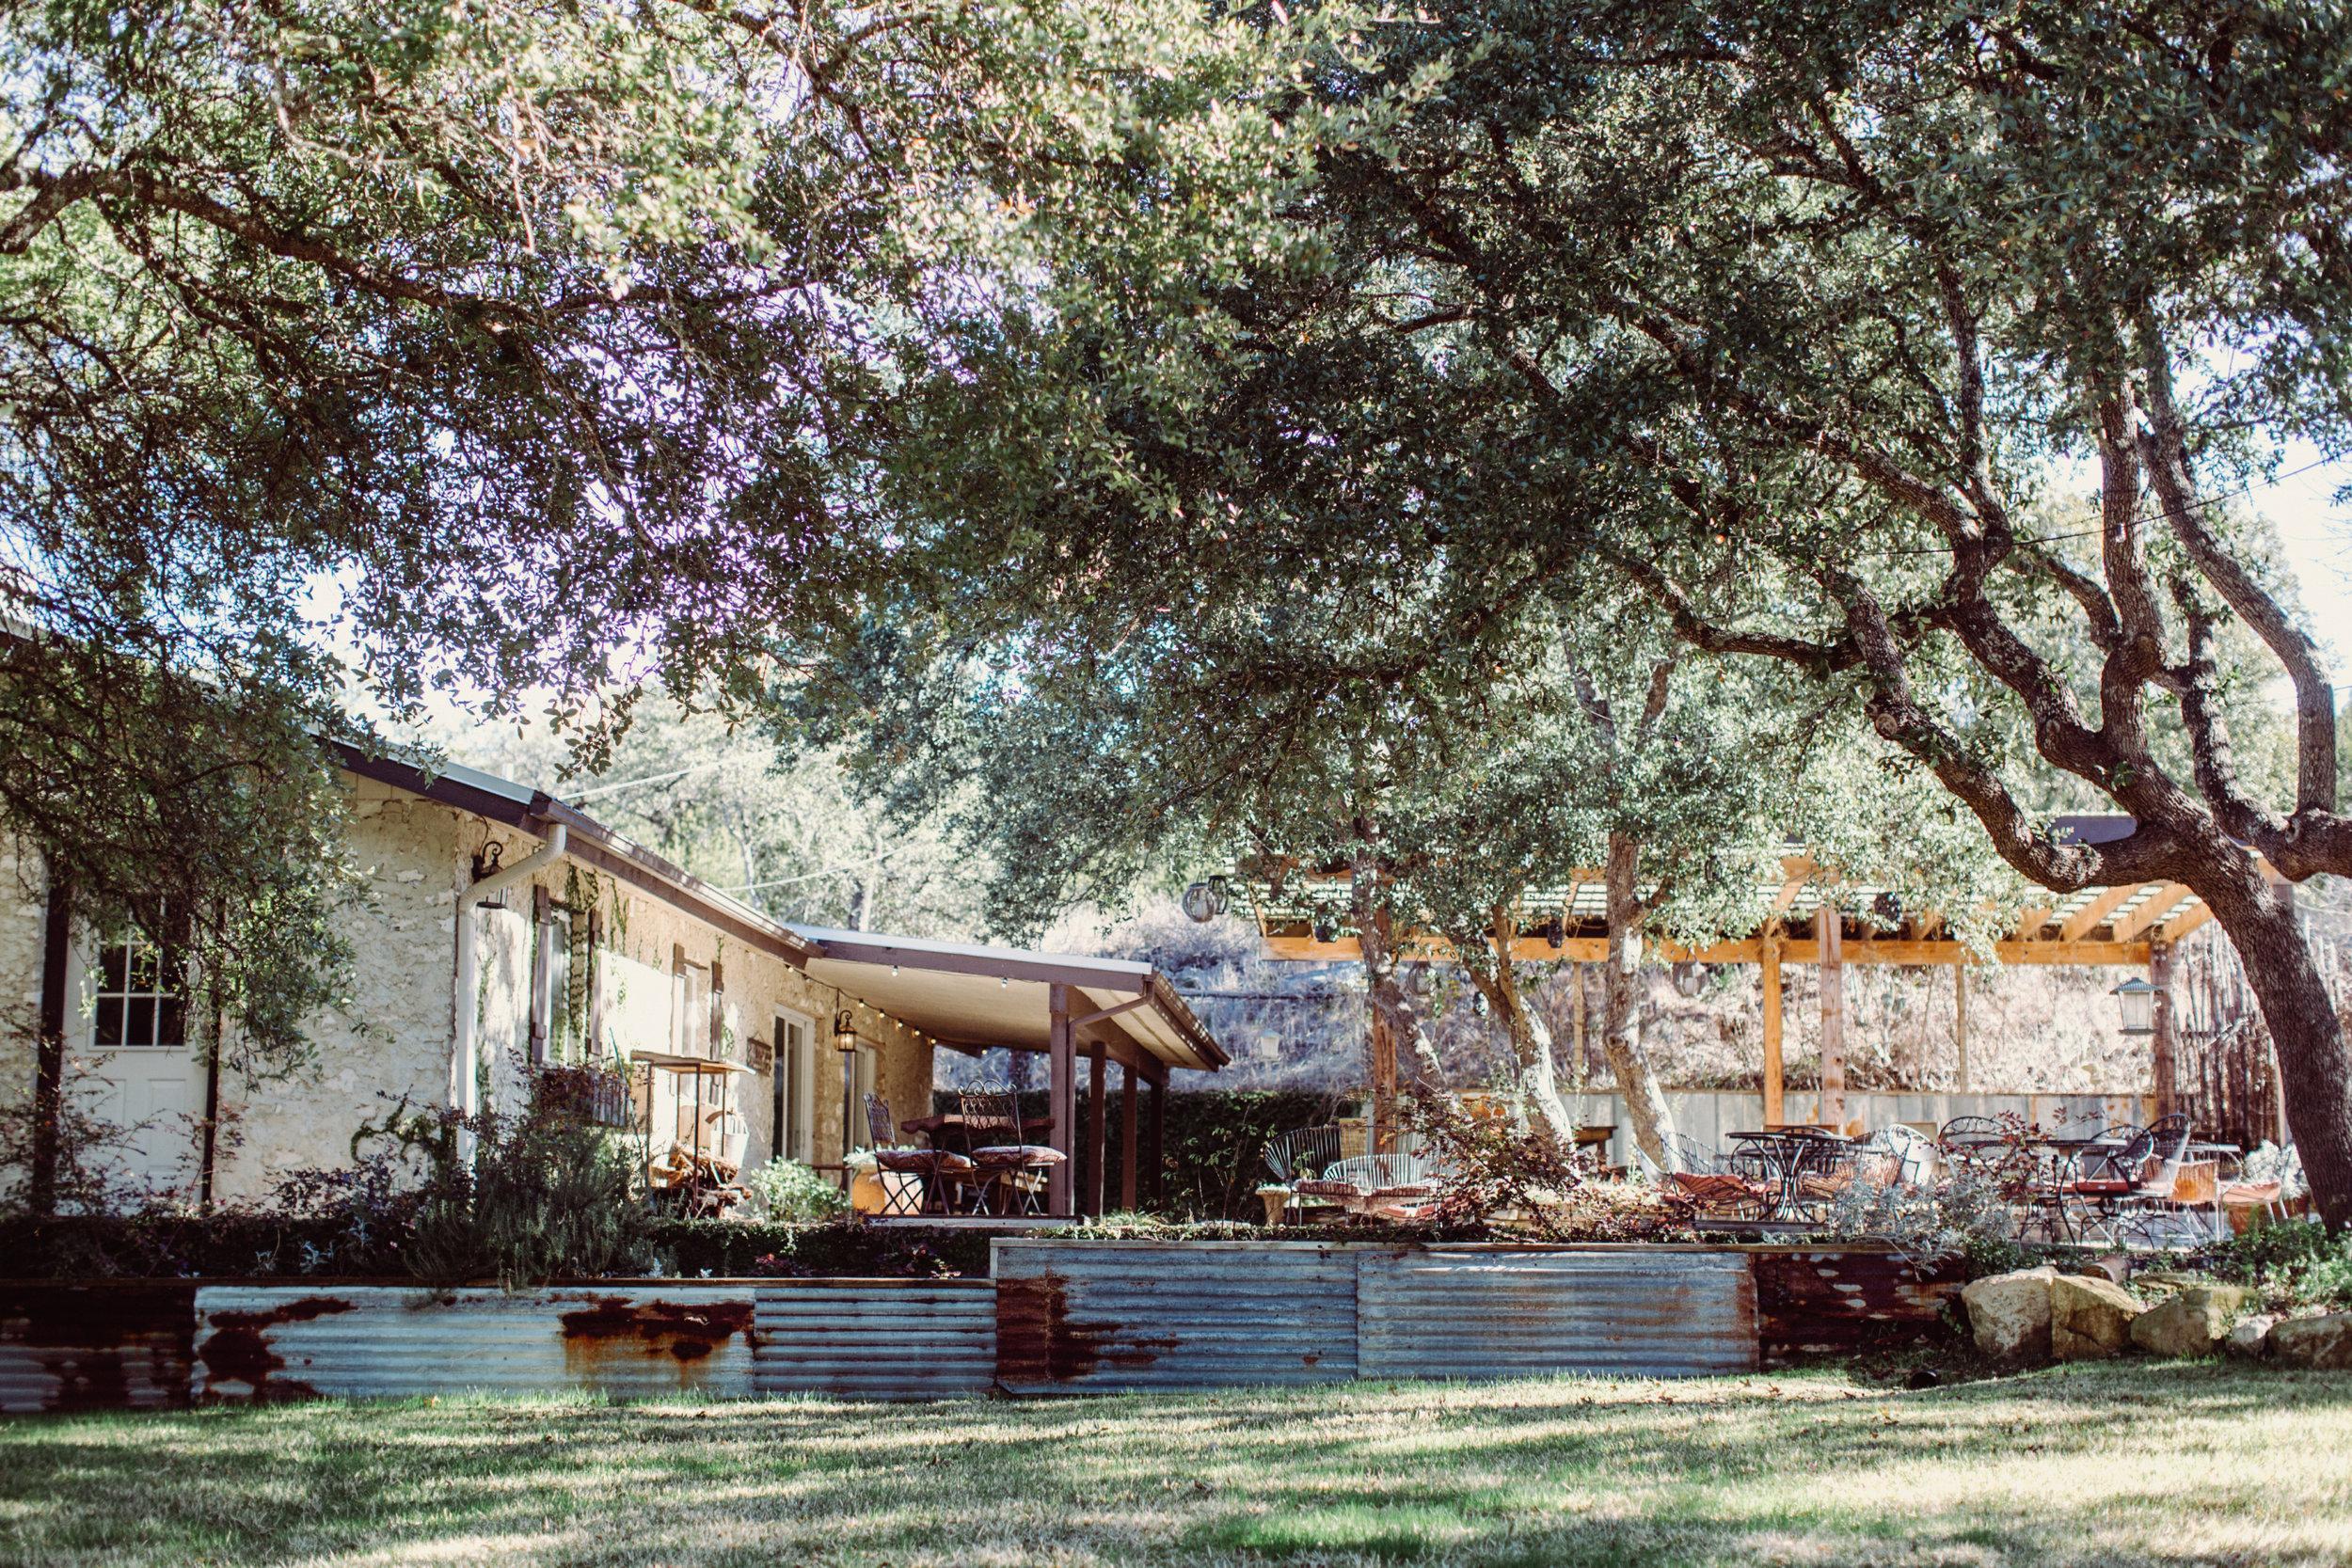 the-creek-haus-austin-texas-wedding-venue-destination-austin-texas-lodging-winter-open-house-honeymoon-cottage-jona-christina-photography